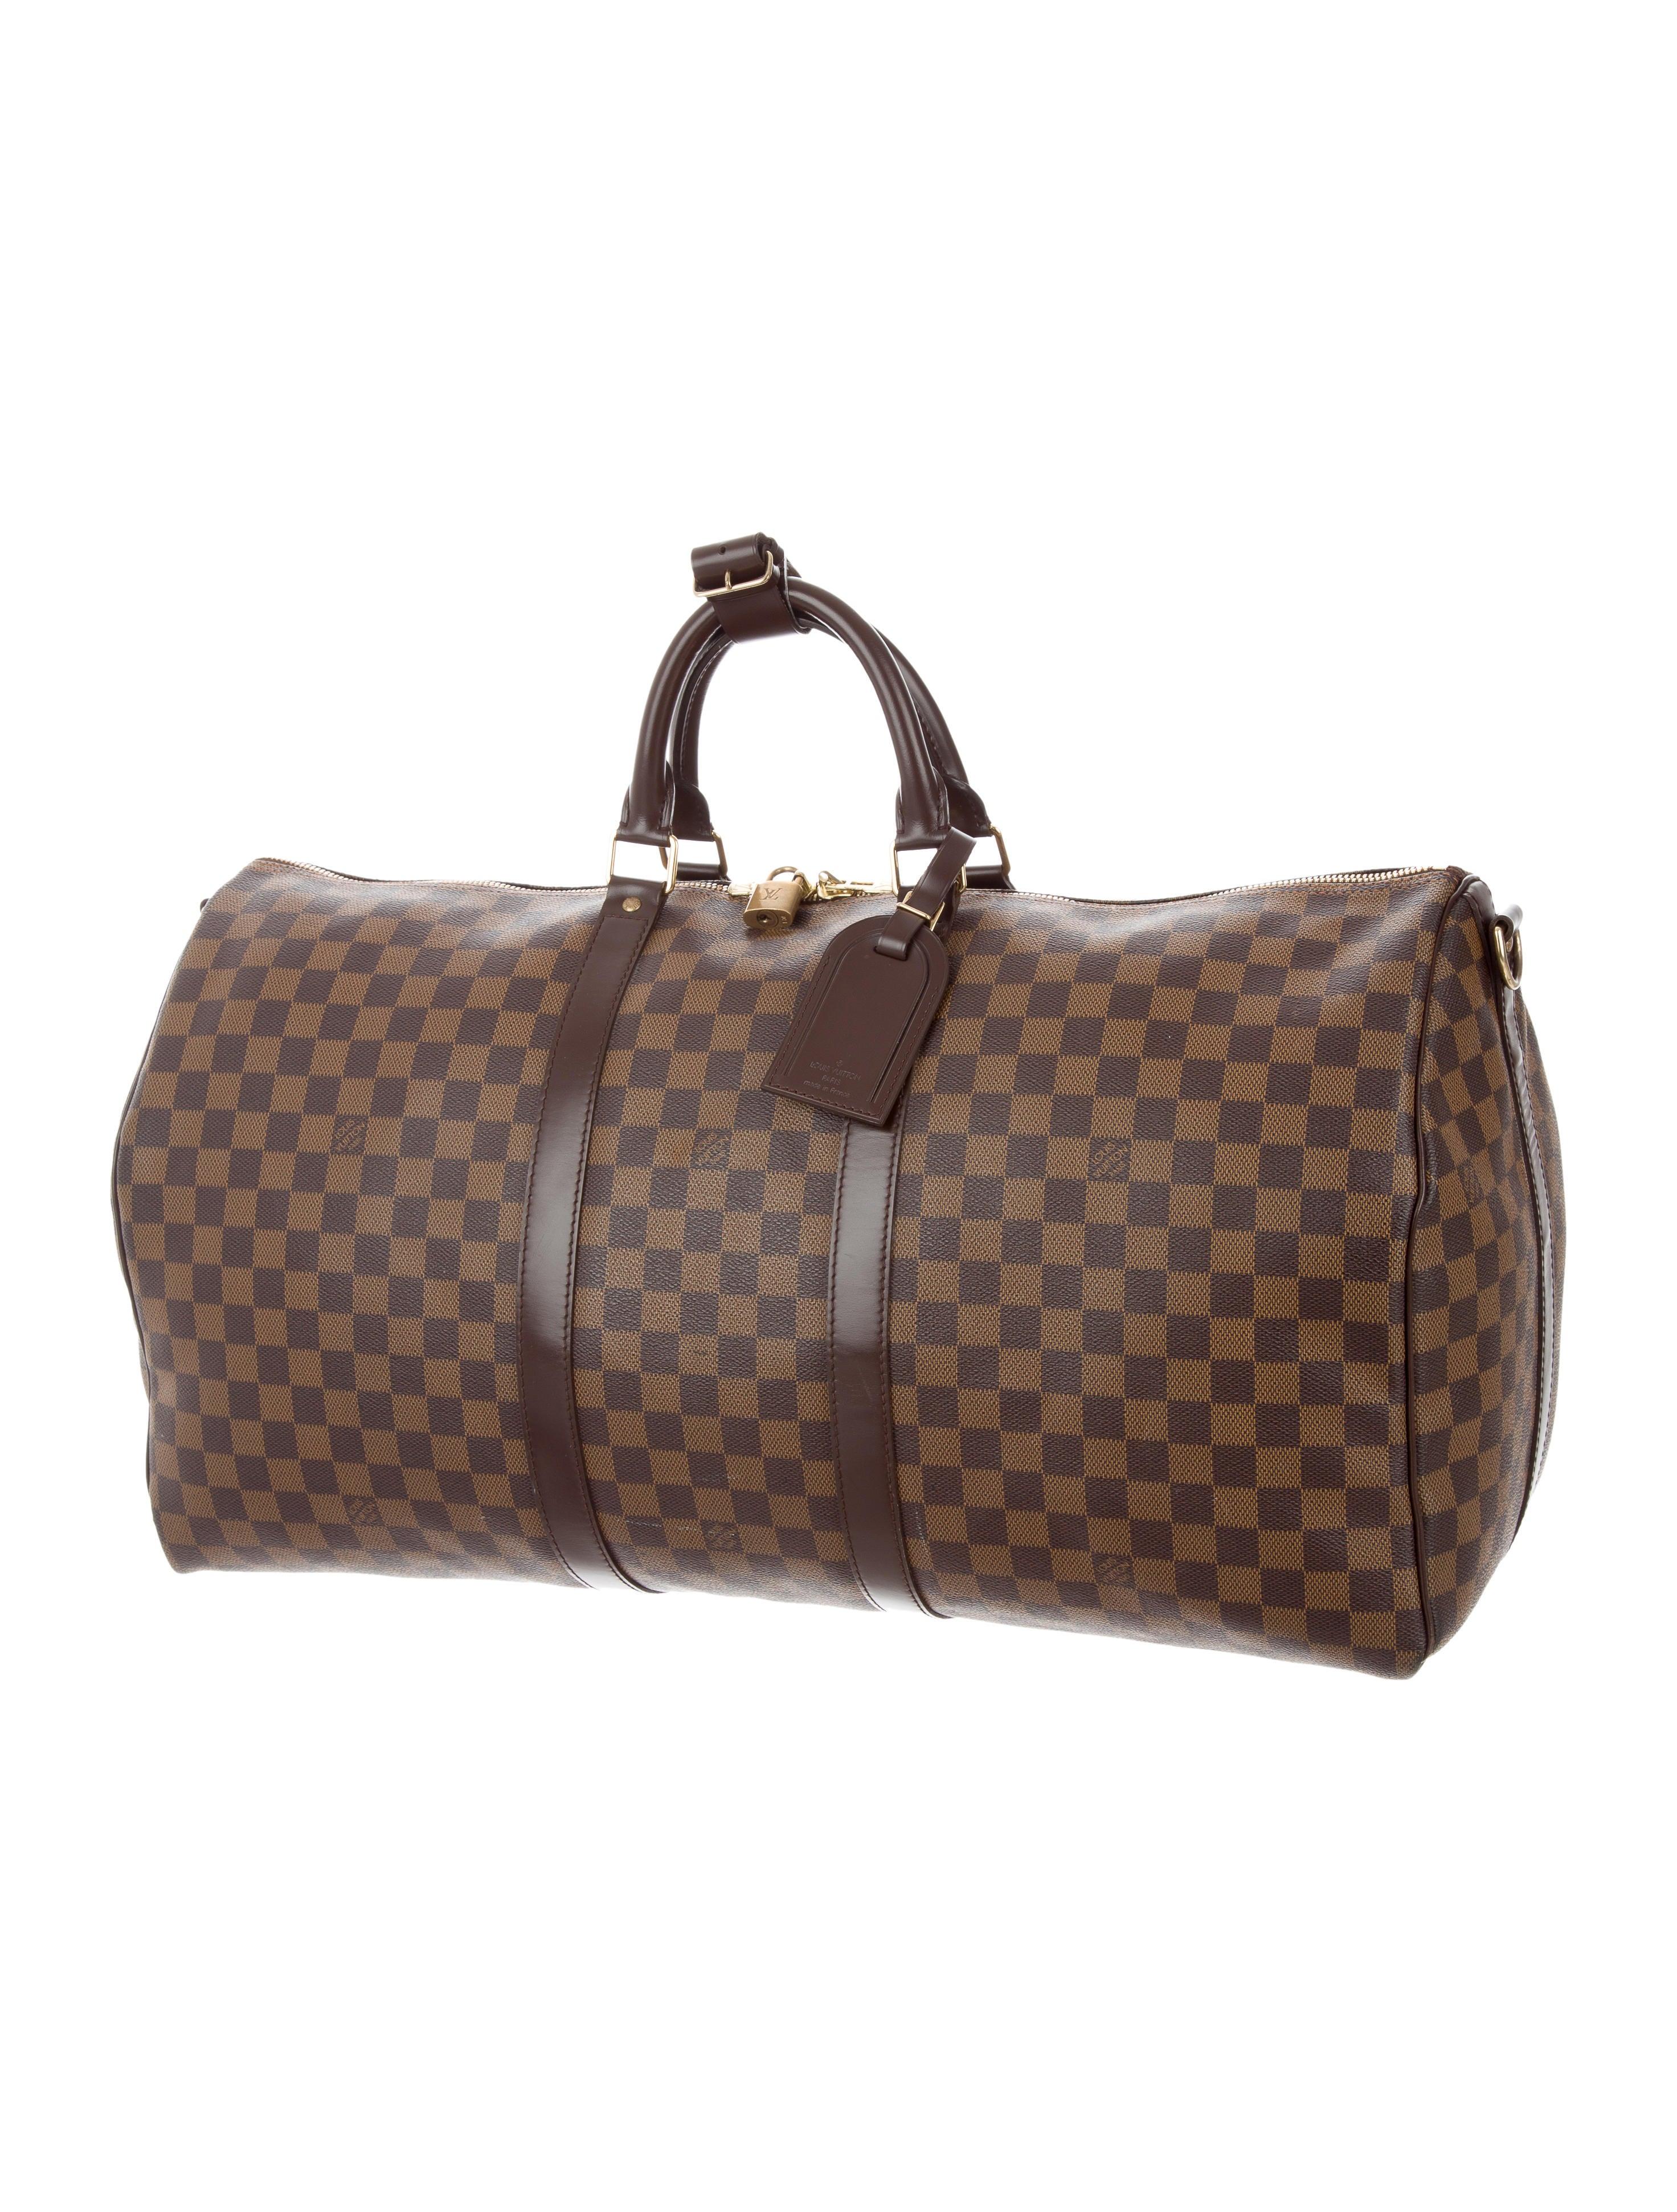 c3e948b7c5c81 Louis Vuitton Damier Ebene Keepall Bandoulière 55 - Bags - LOU132404